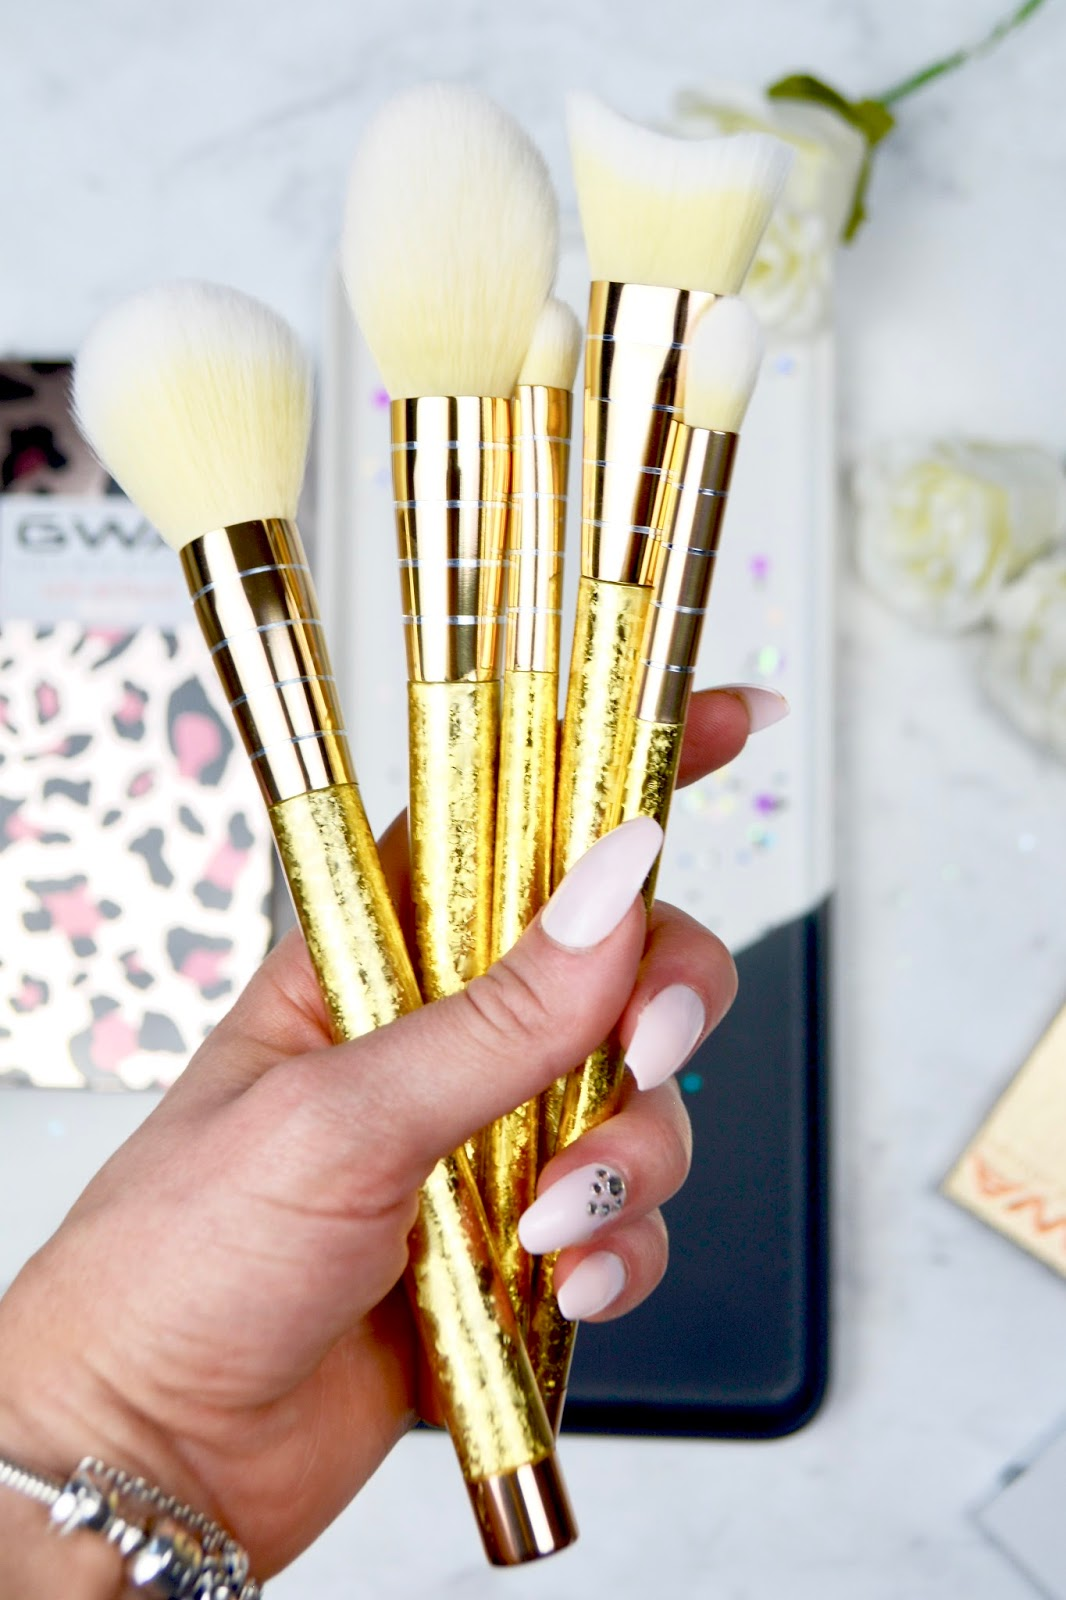 Girls With Attitude Luxe Metallics Makeup Brush Set